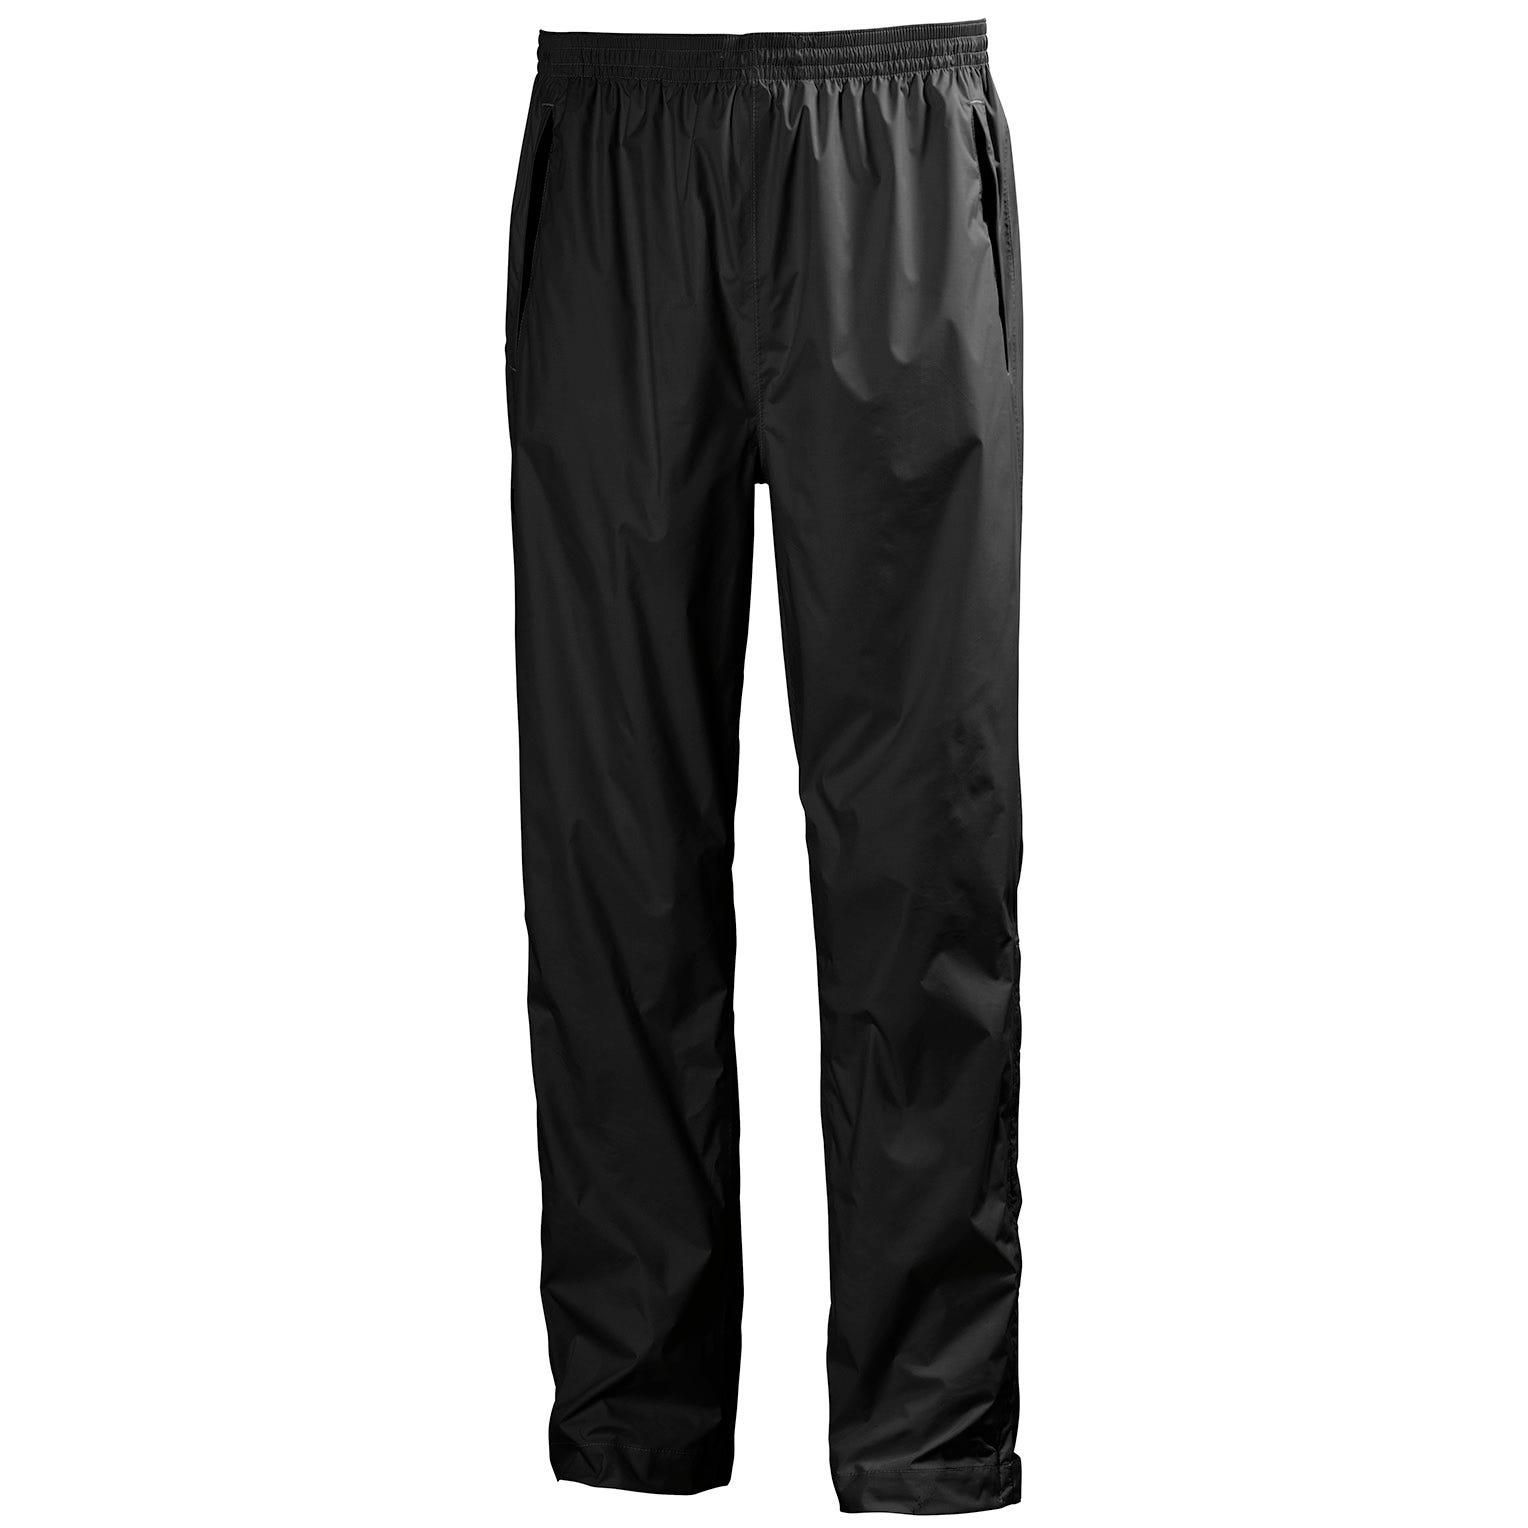 Helly Hansen Loke Pants Mens Hiking Pant Black XXL